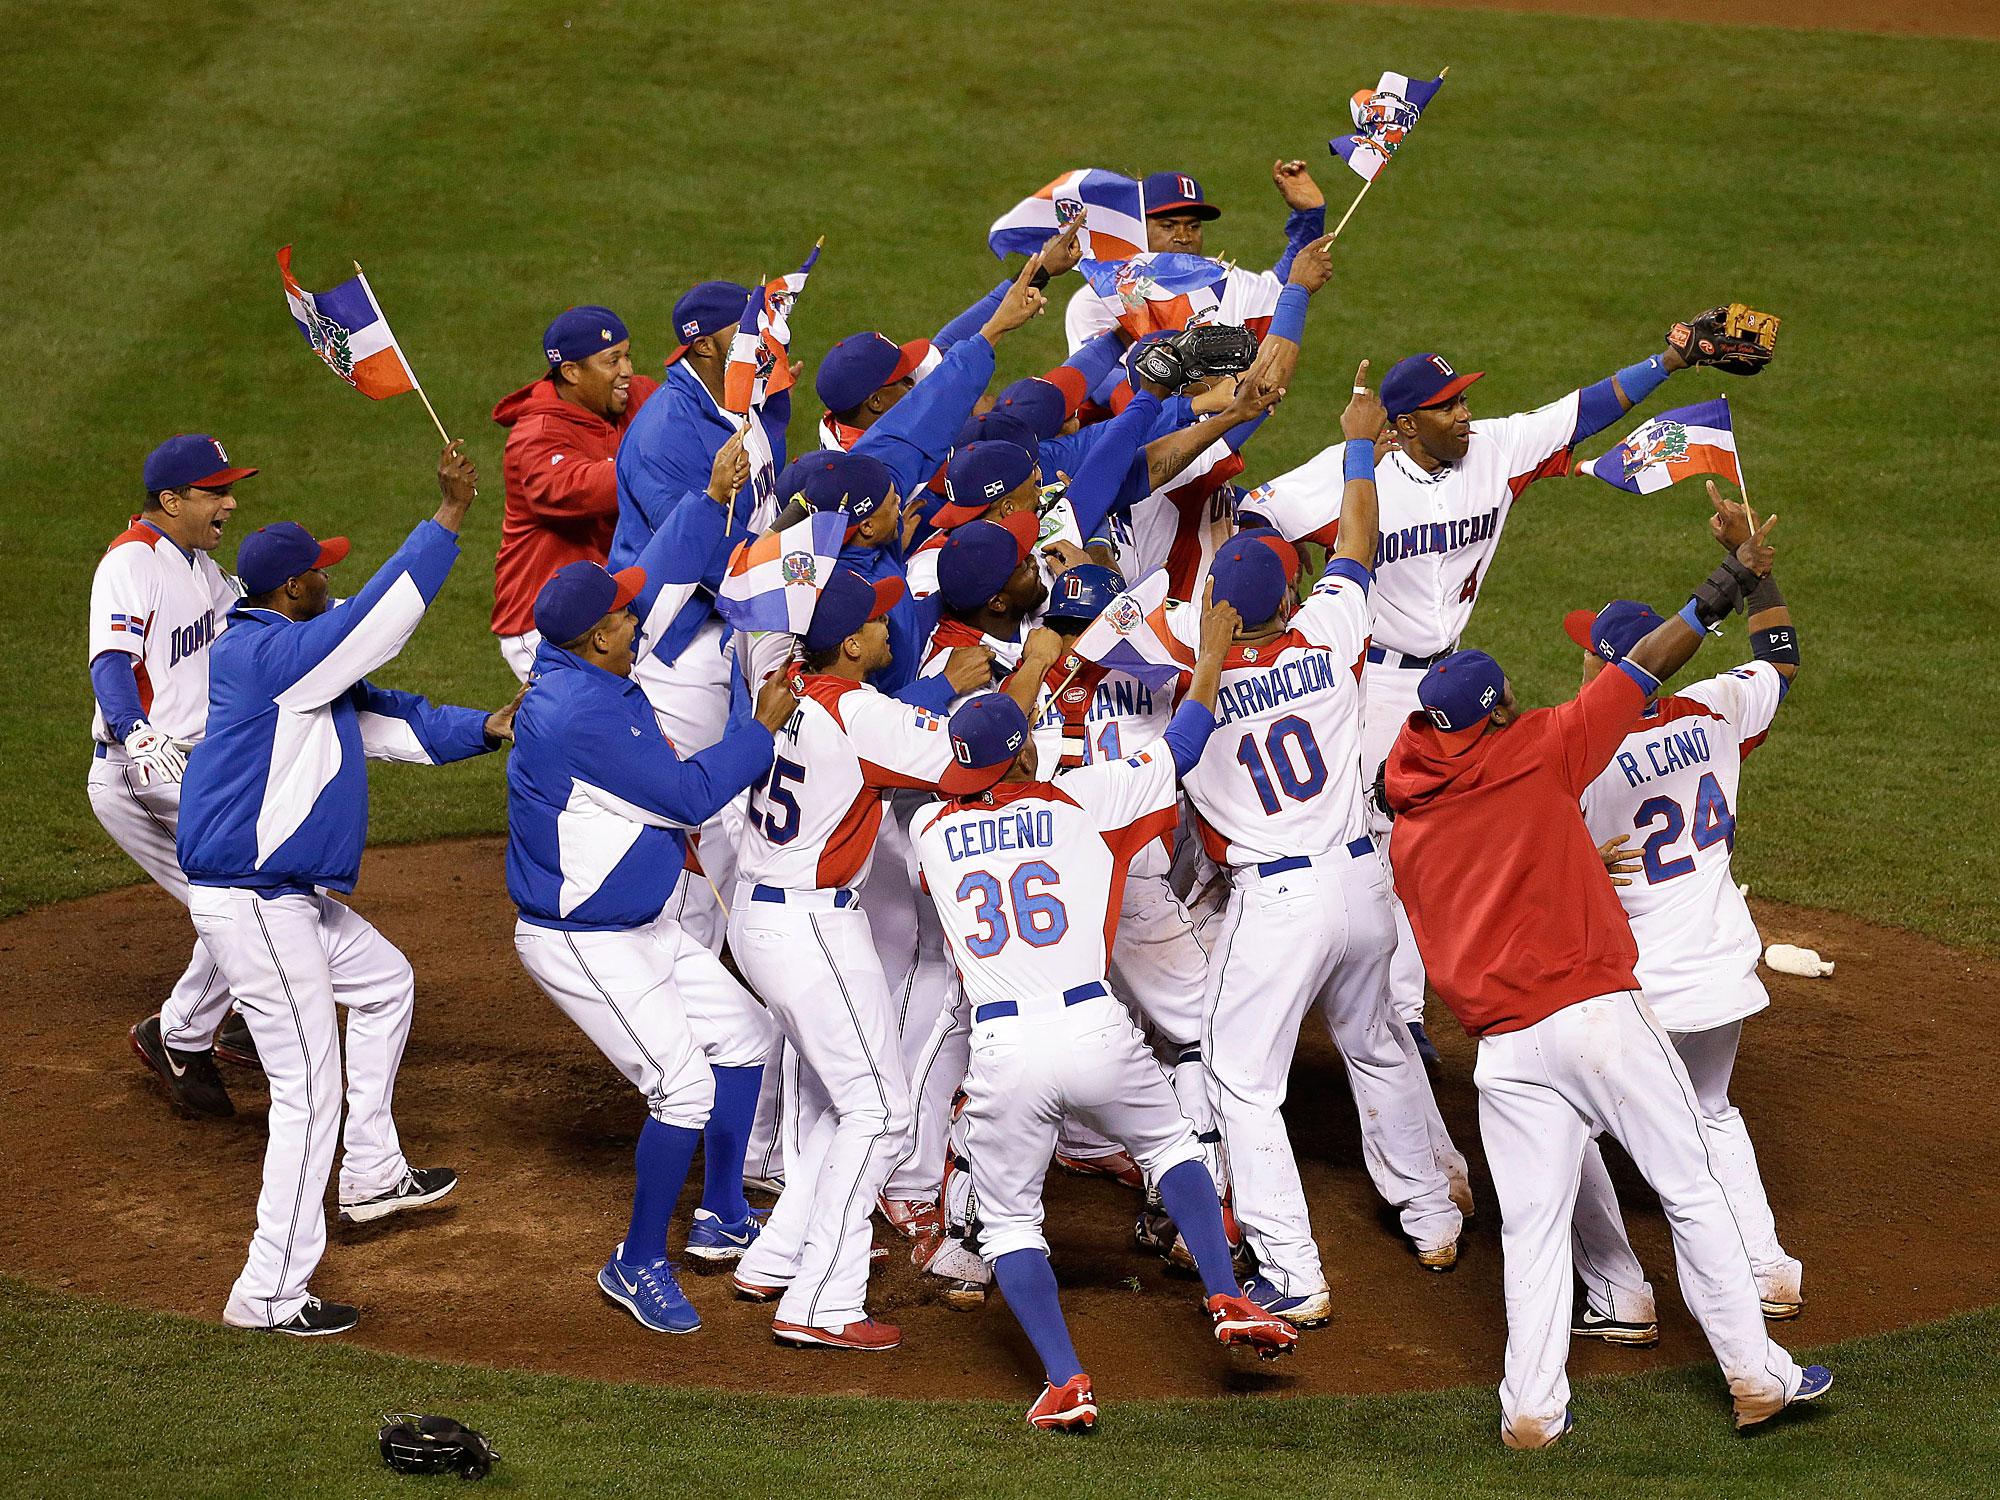 The Dominican Republic won the 2013 World Baseball Classic.